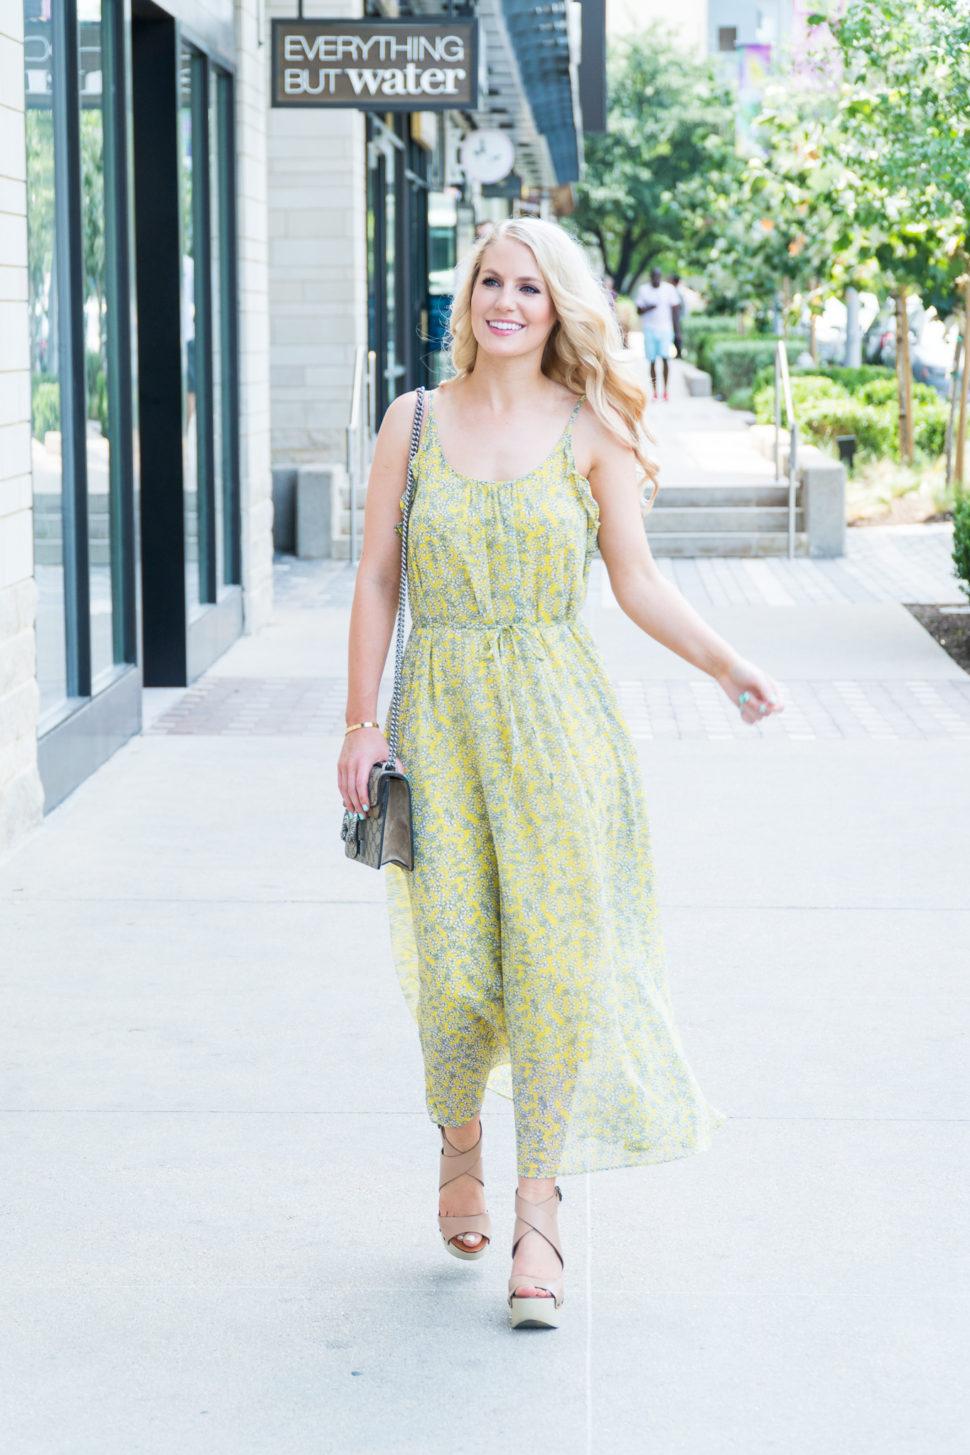 Fashion blogger The Trendy Tomboy wears Ruffle Trim Slip Dress - Who What Wear